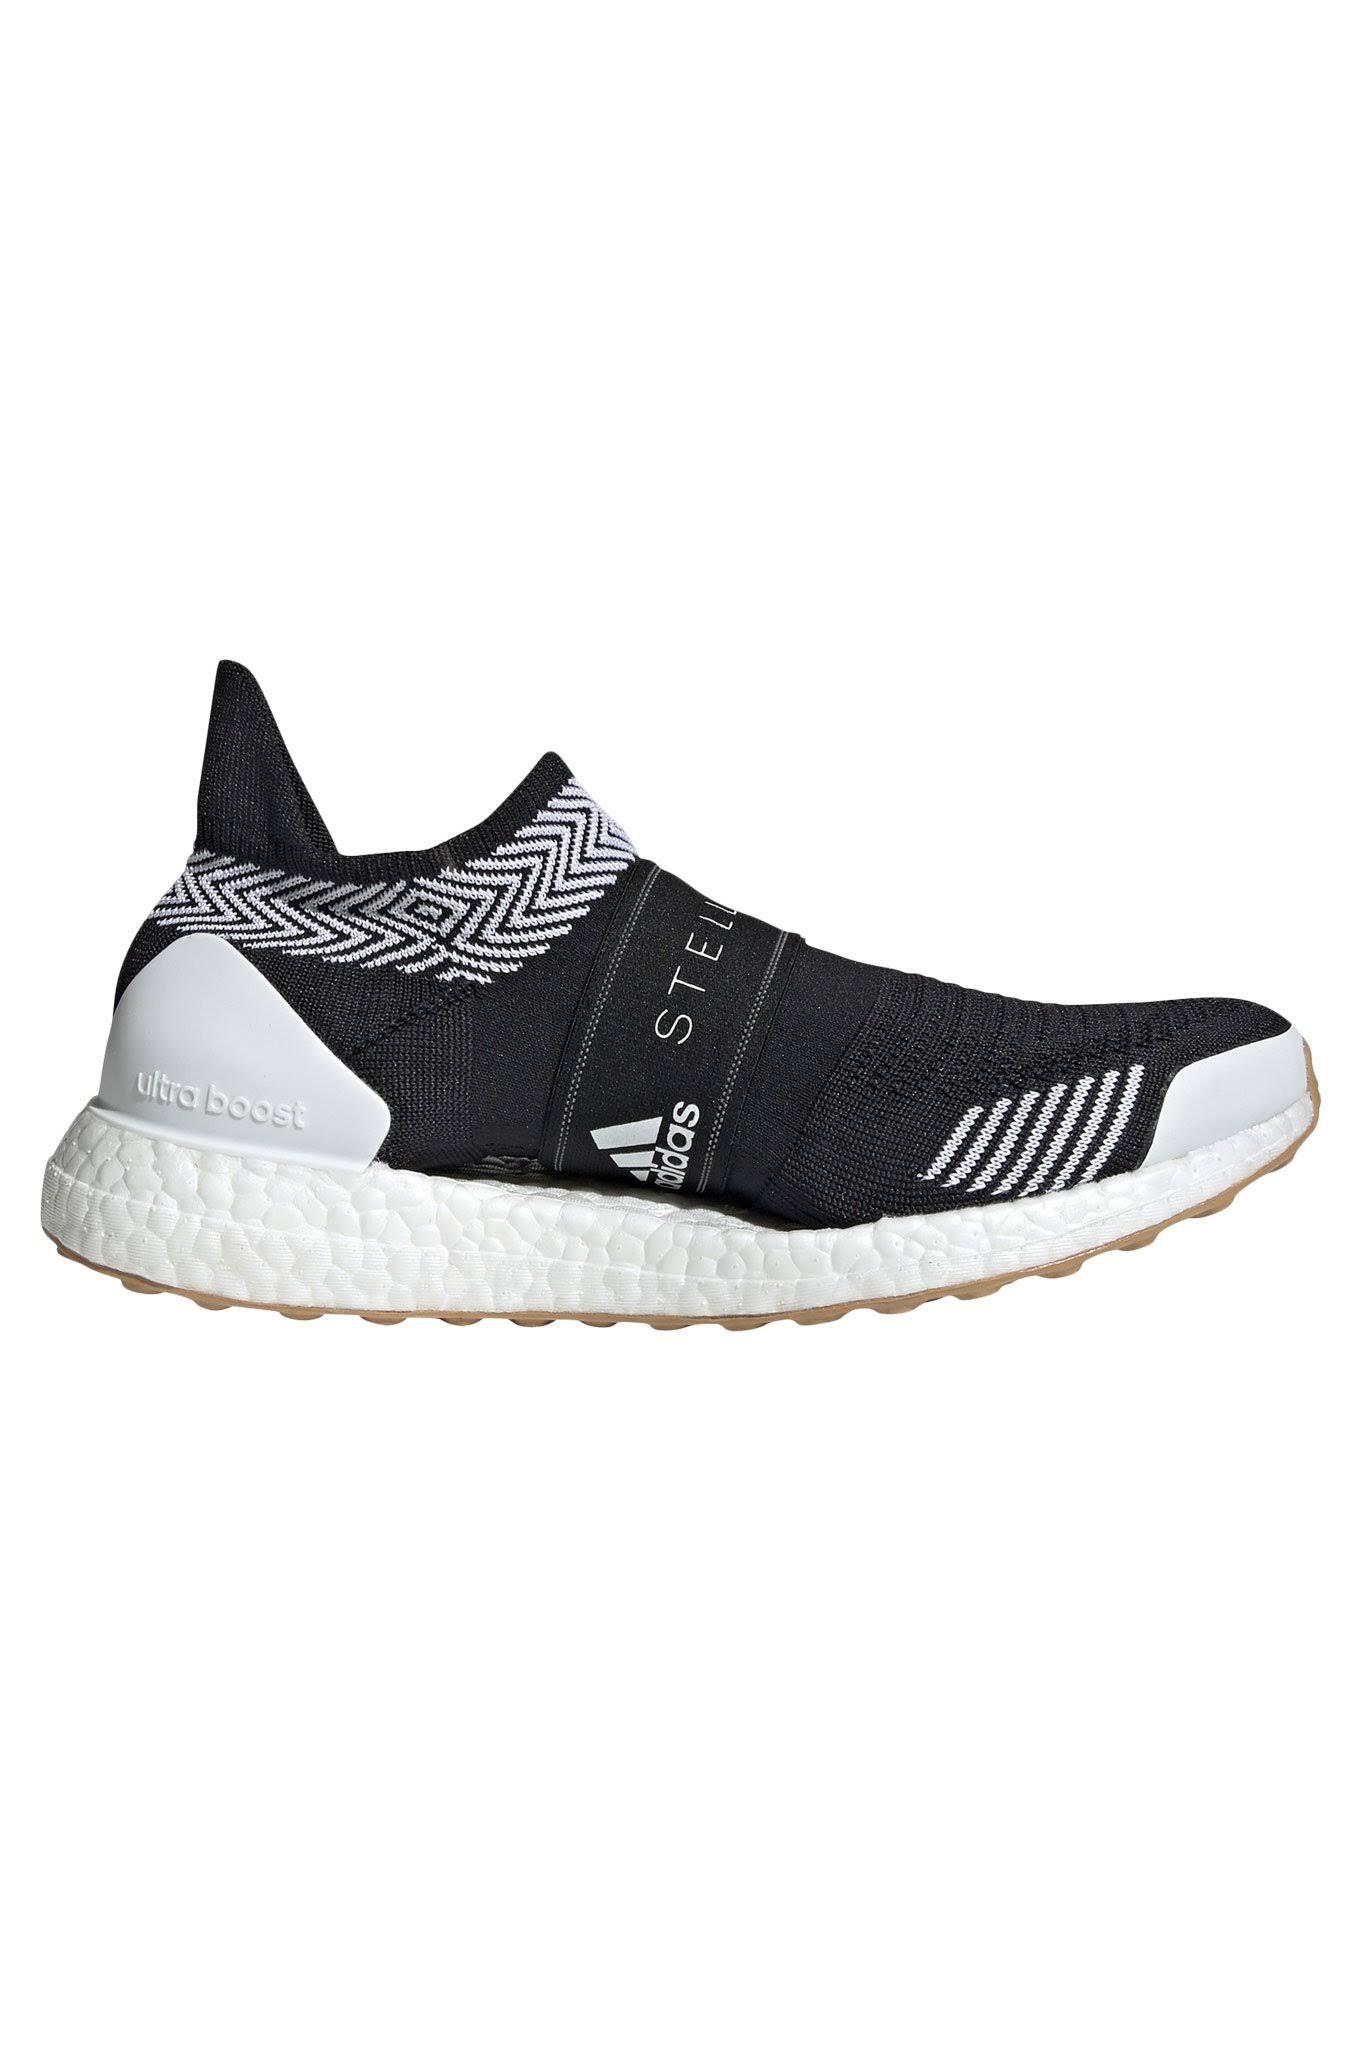 Adidas x Stella McCartney Ultraboost x 3D Knit Shoes - Black/White - UK 7.5